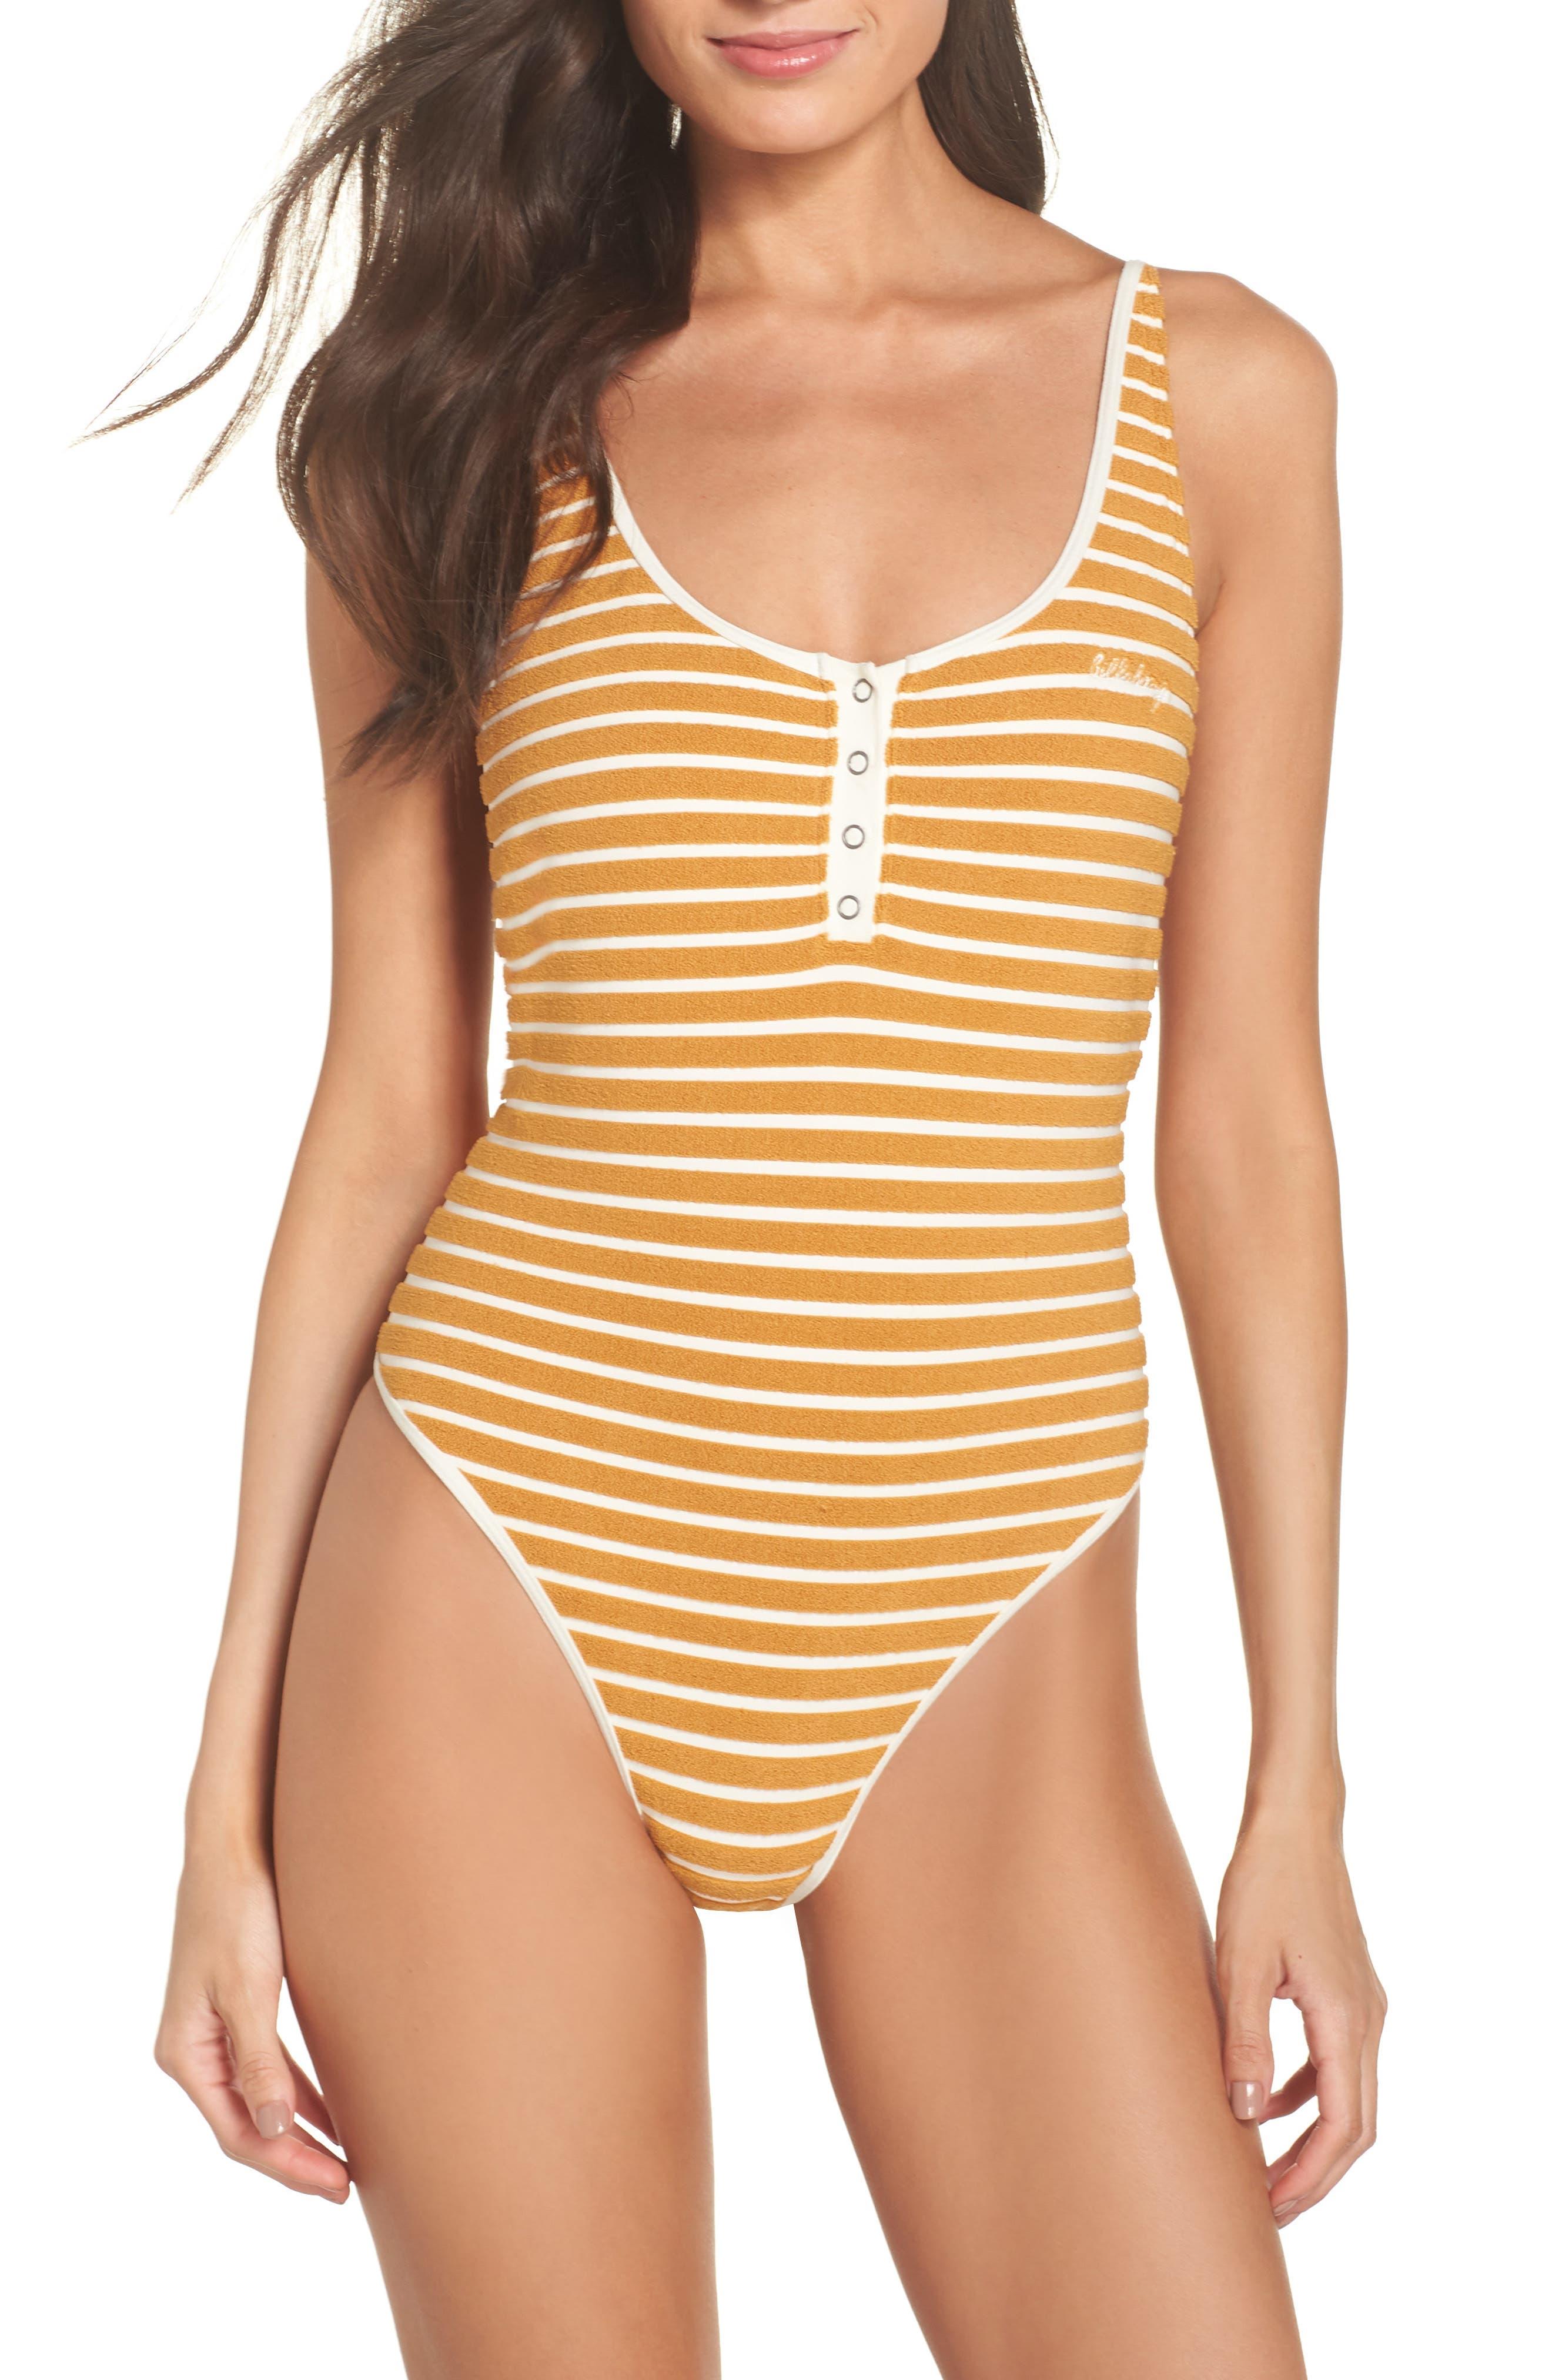 60s Swimsuits, 70s Bathing Suits | Retro Swimwear Womens Billabong Honey Daze One-Piece Swimsuit $53.96 AT vintagedancer.com